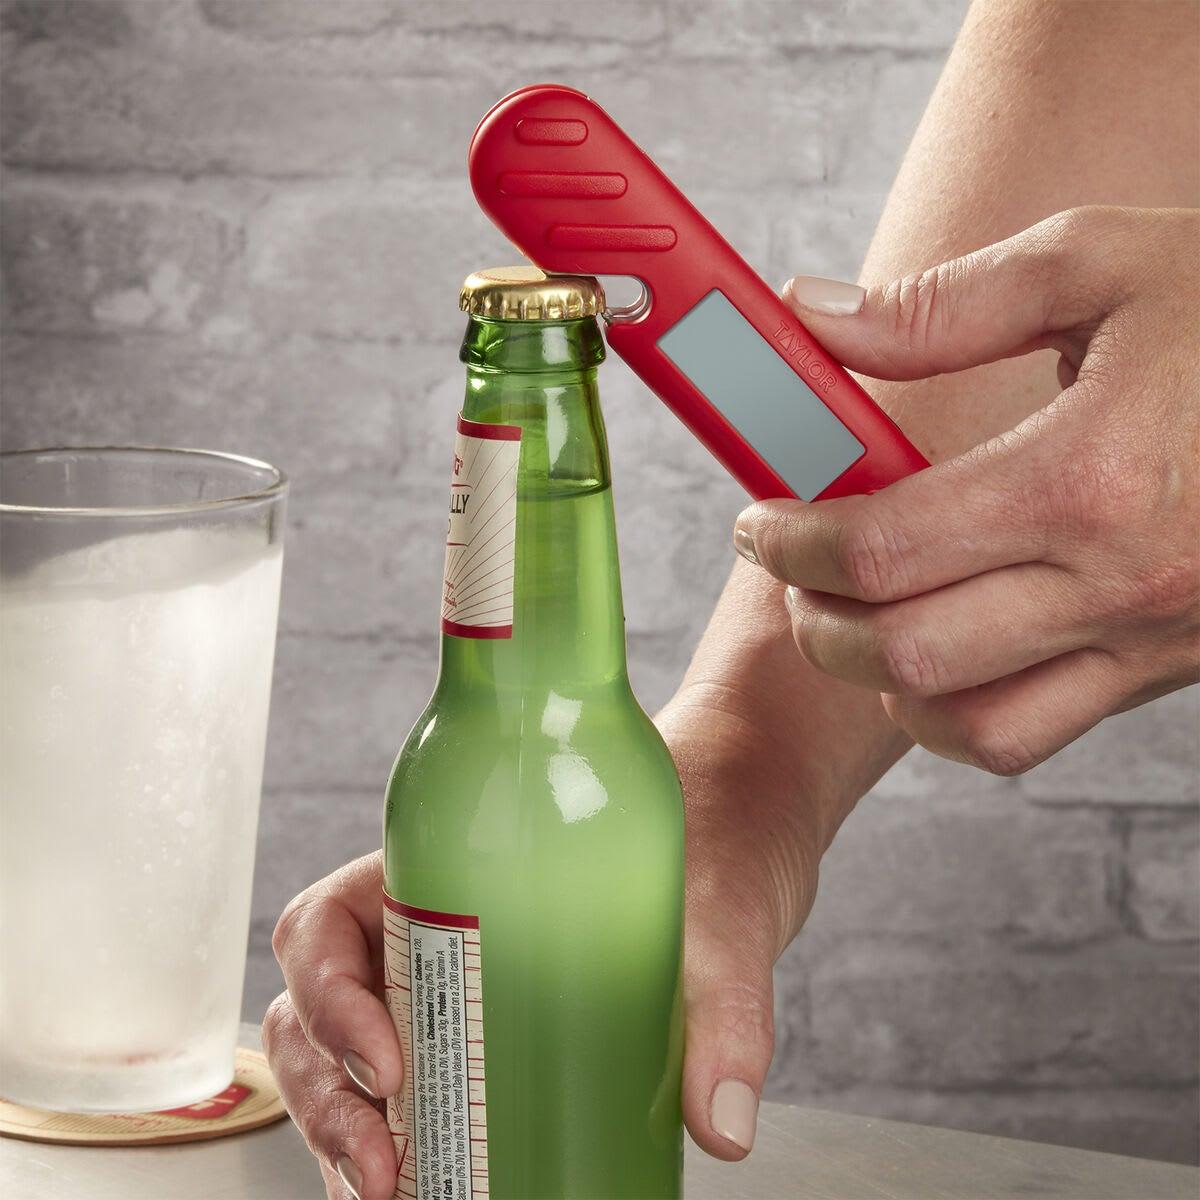 Taylor Digital Thermometer and Bottle Opener - bottle